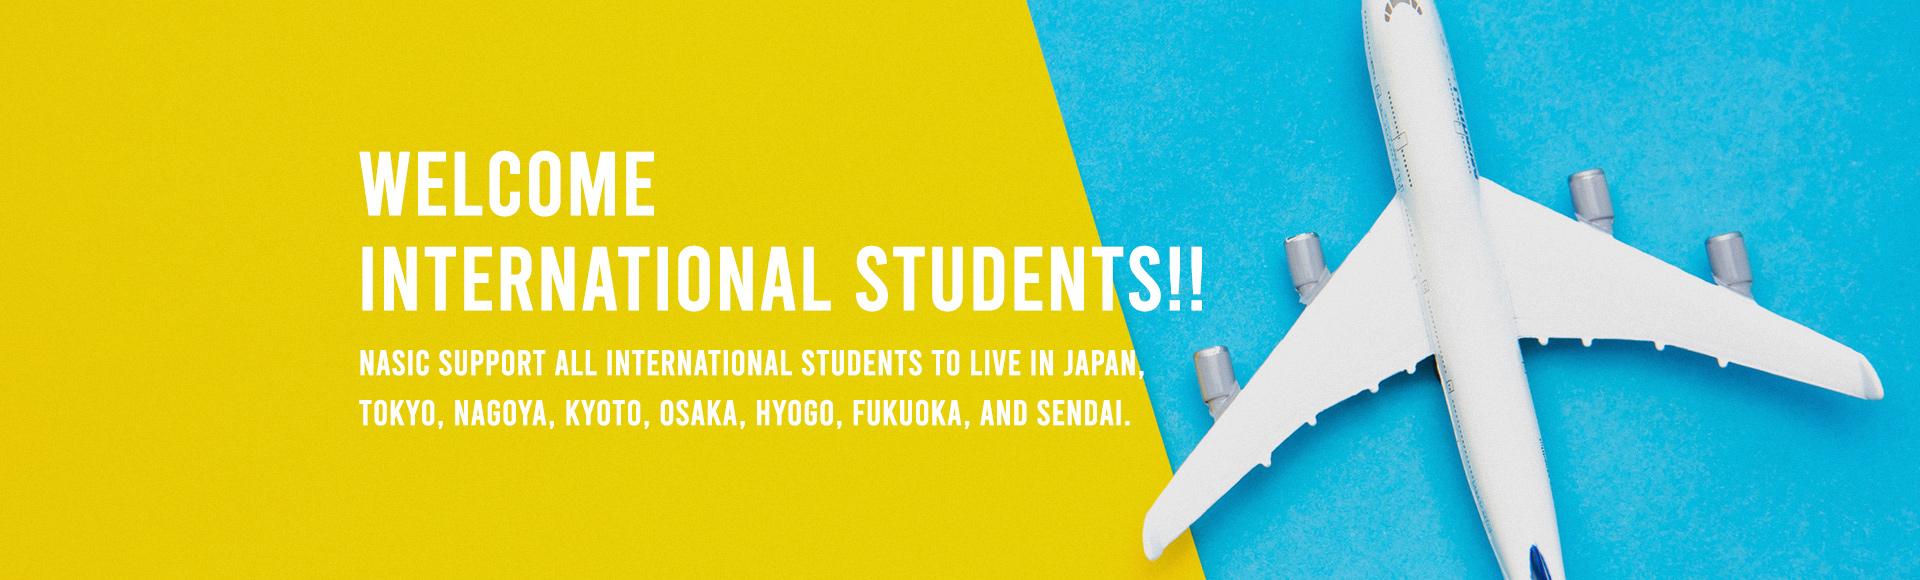 WELCOME INTERNATIONAL STUDENTS!! Nasic support all international students to live in Japan, Tokyo, Nagoya, Kyoto, Osaka, Hyogo, Fukuoka, and Sendai.